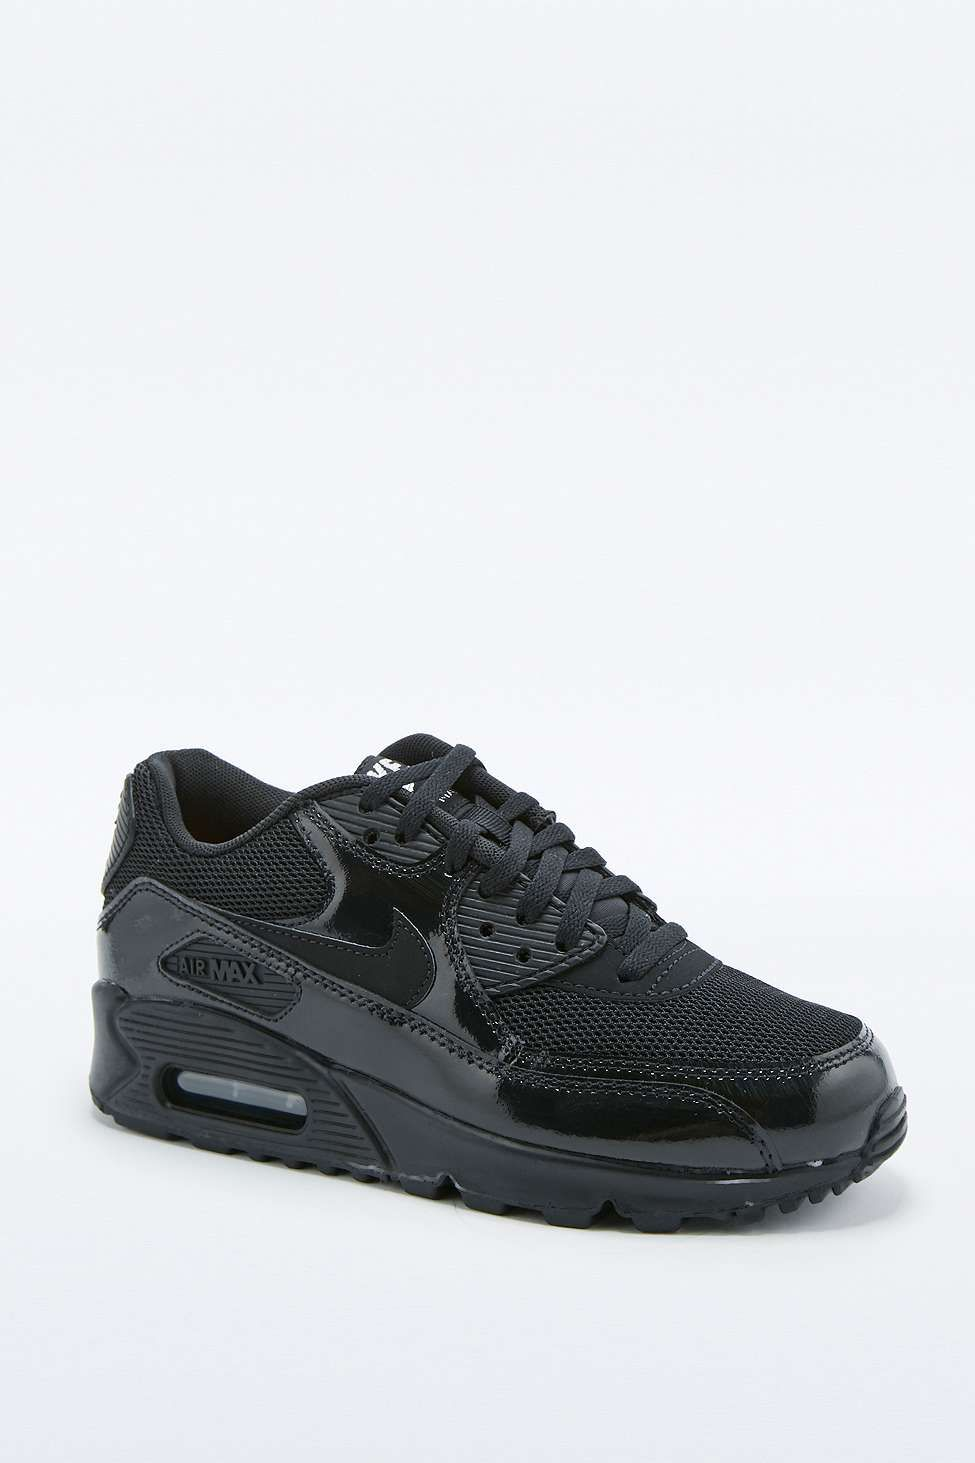 Nike Air Max 90 Premium Black Trainers